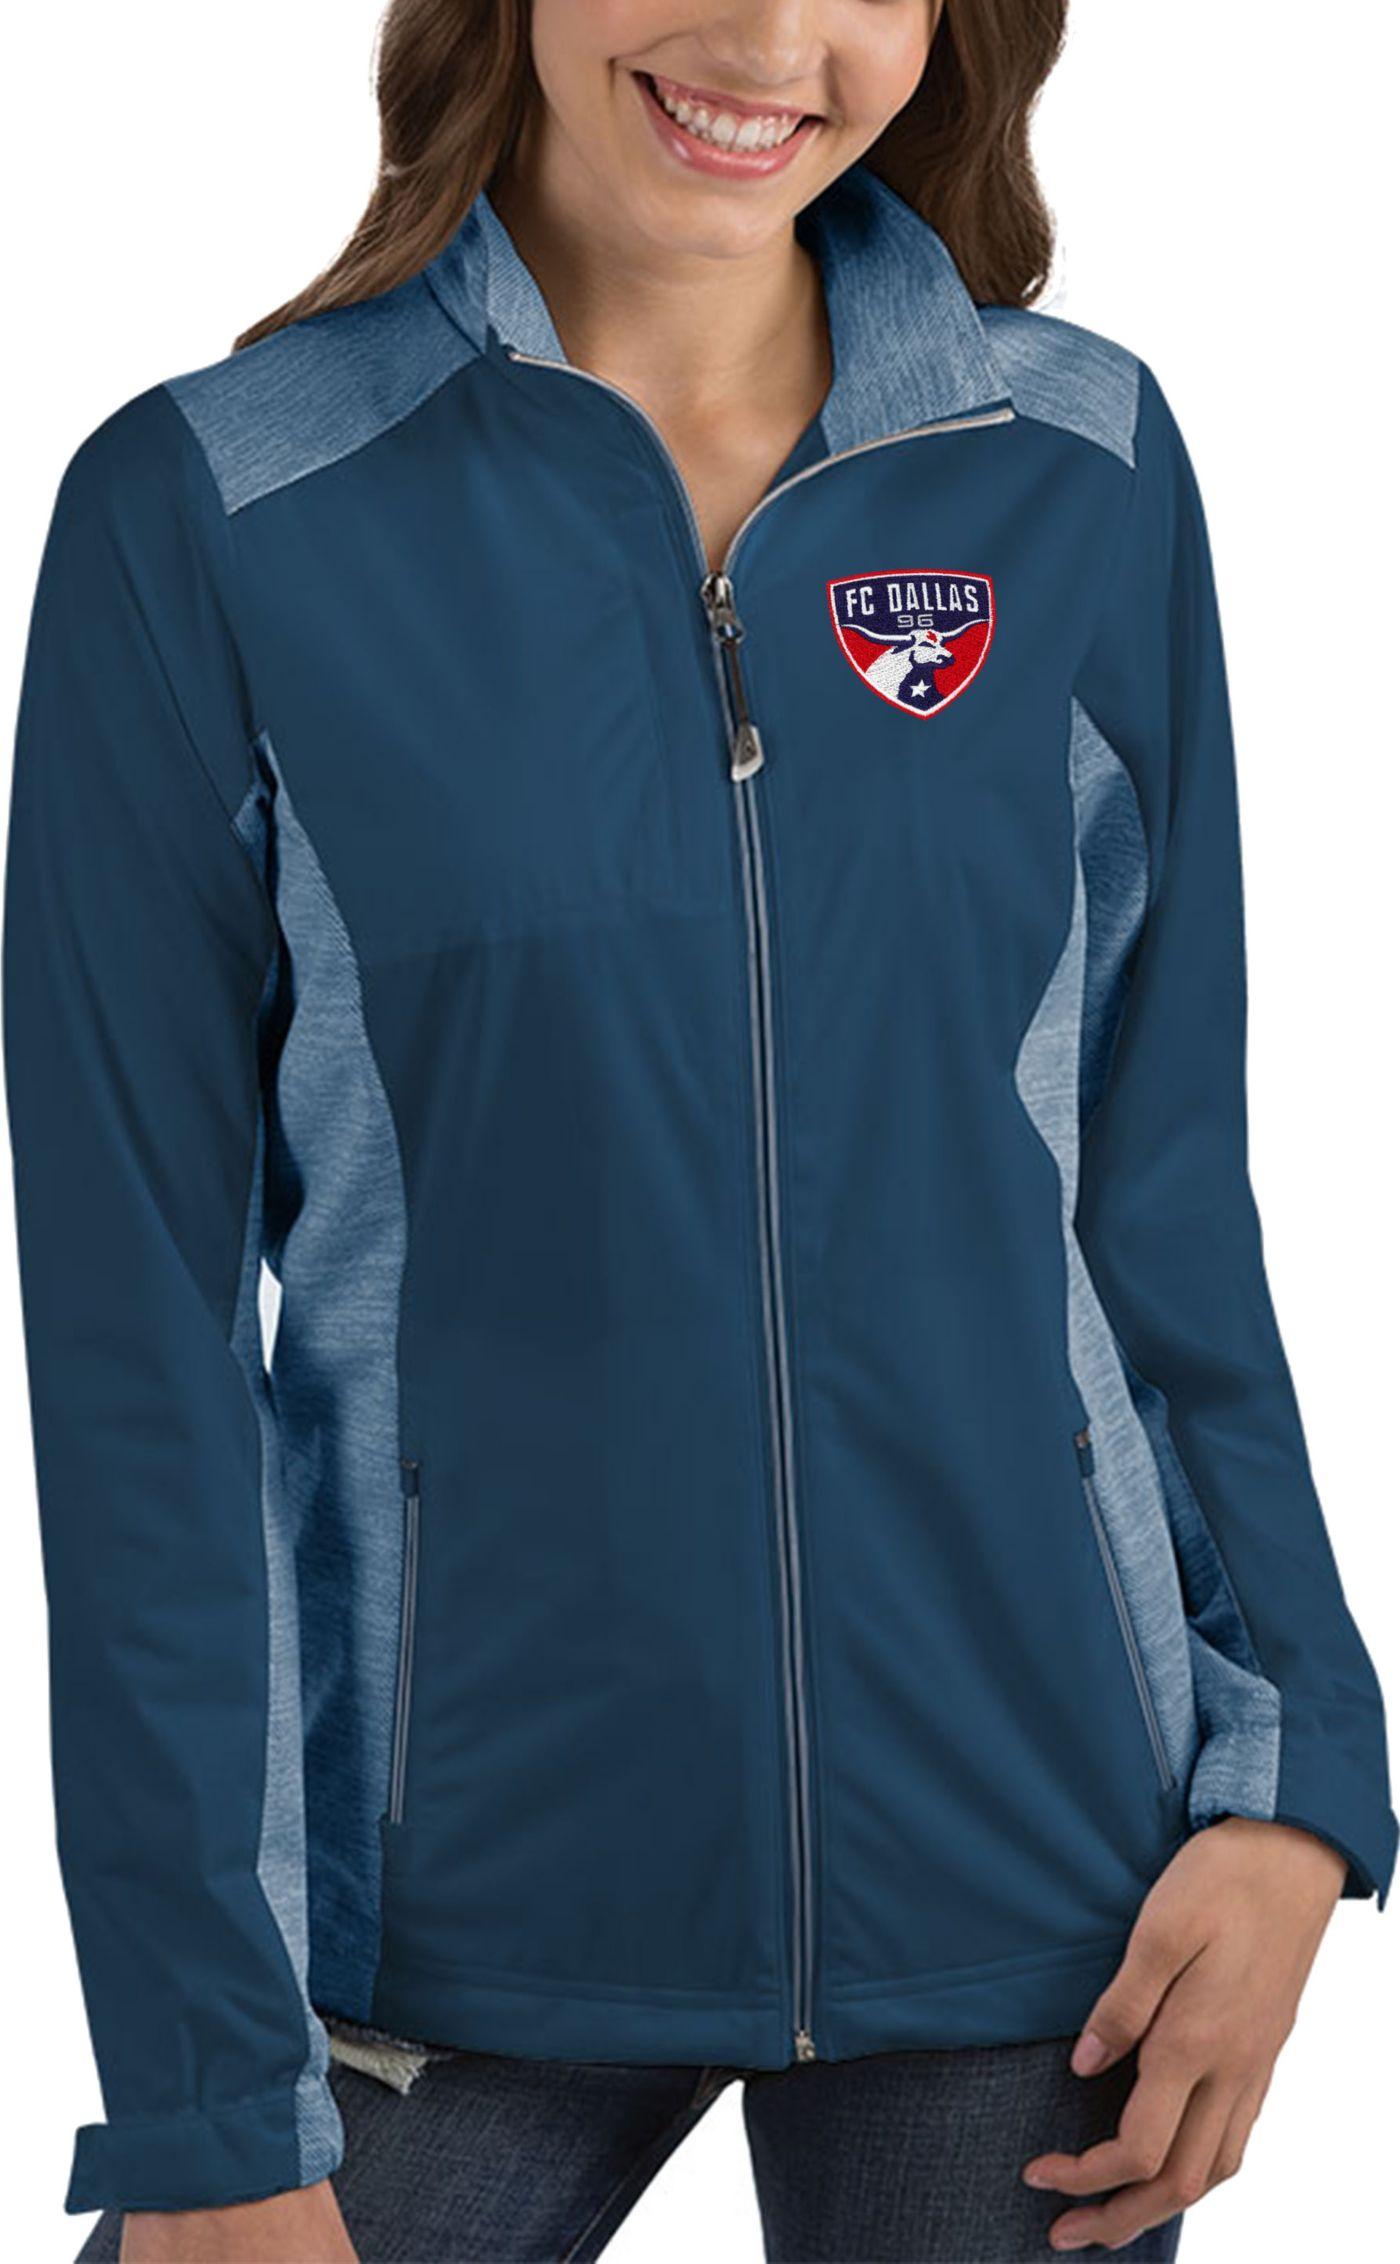 Antigua Women's FC Dallas Revolve Navy Full-Zip Jacket